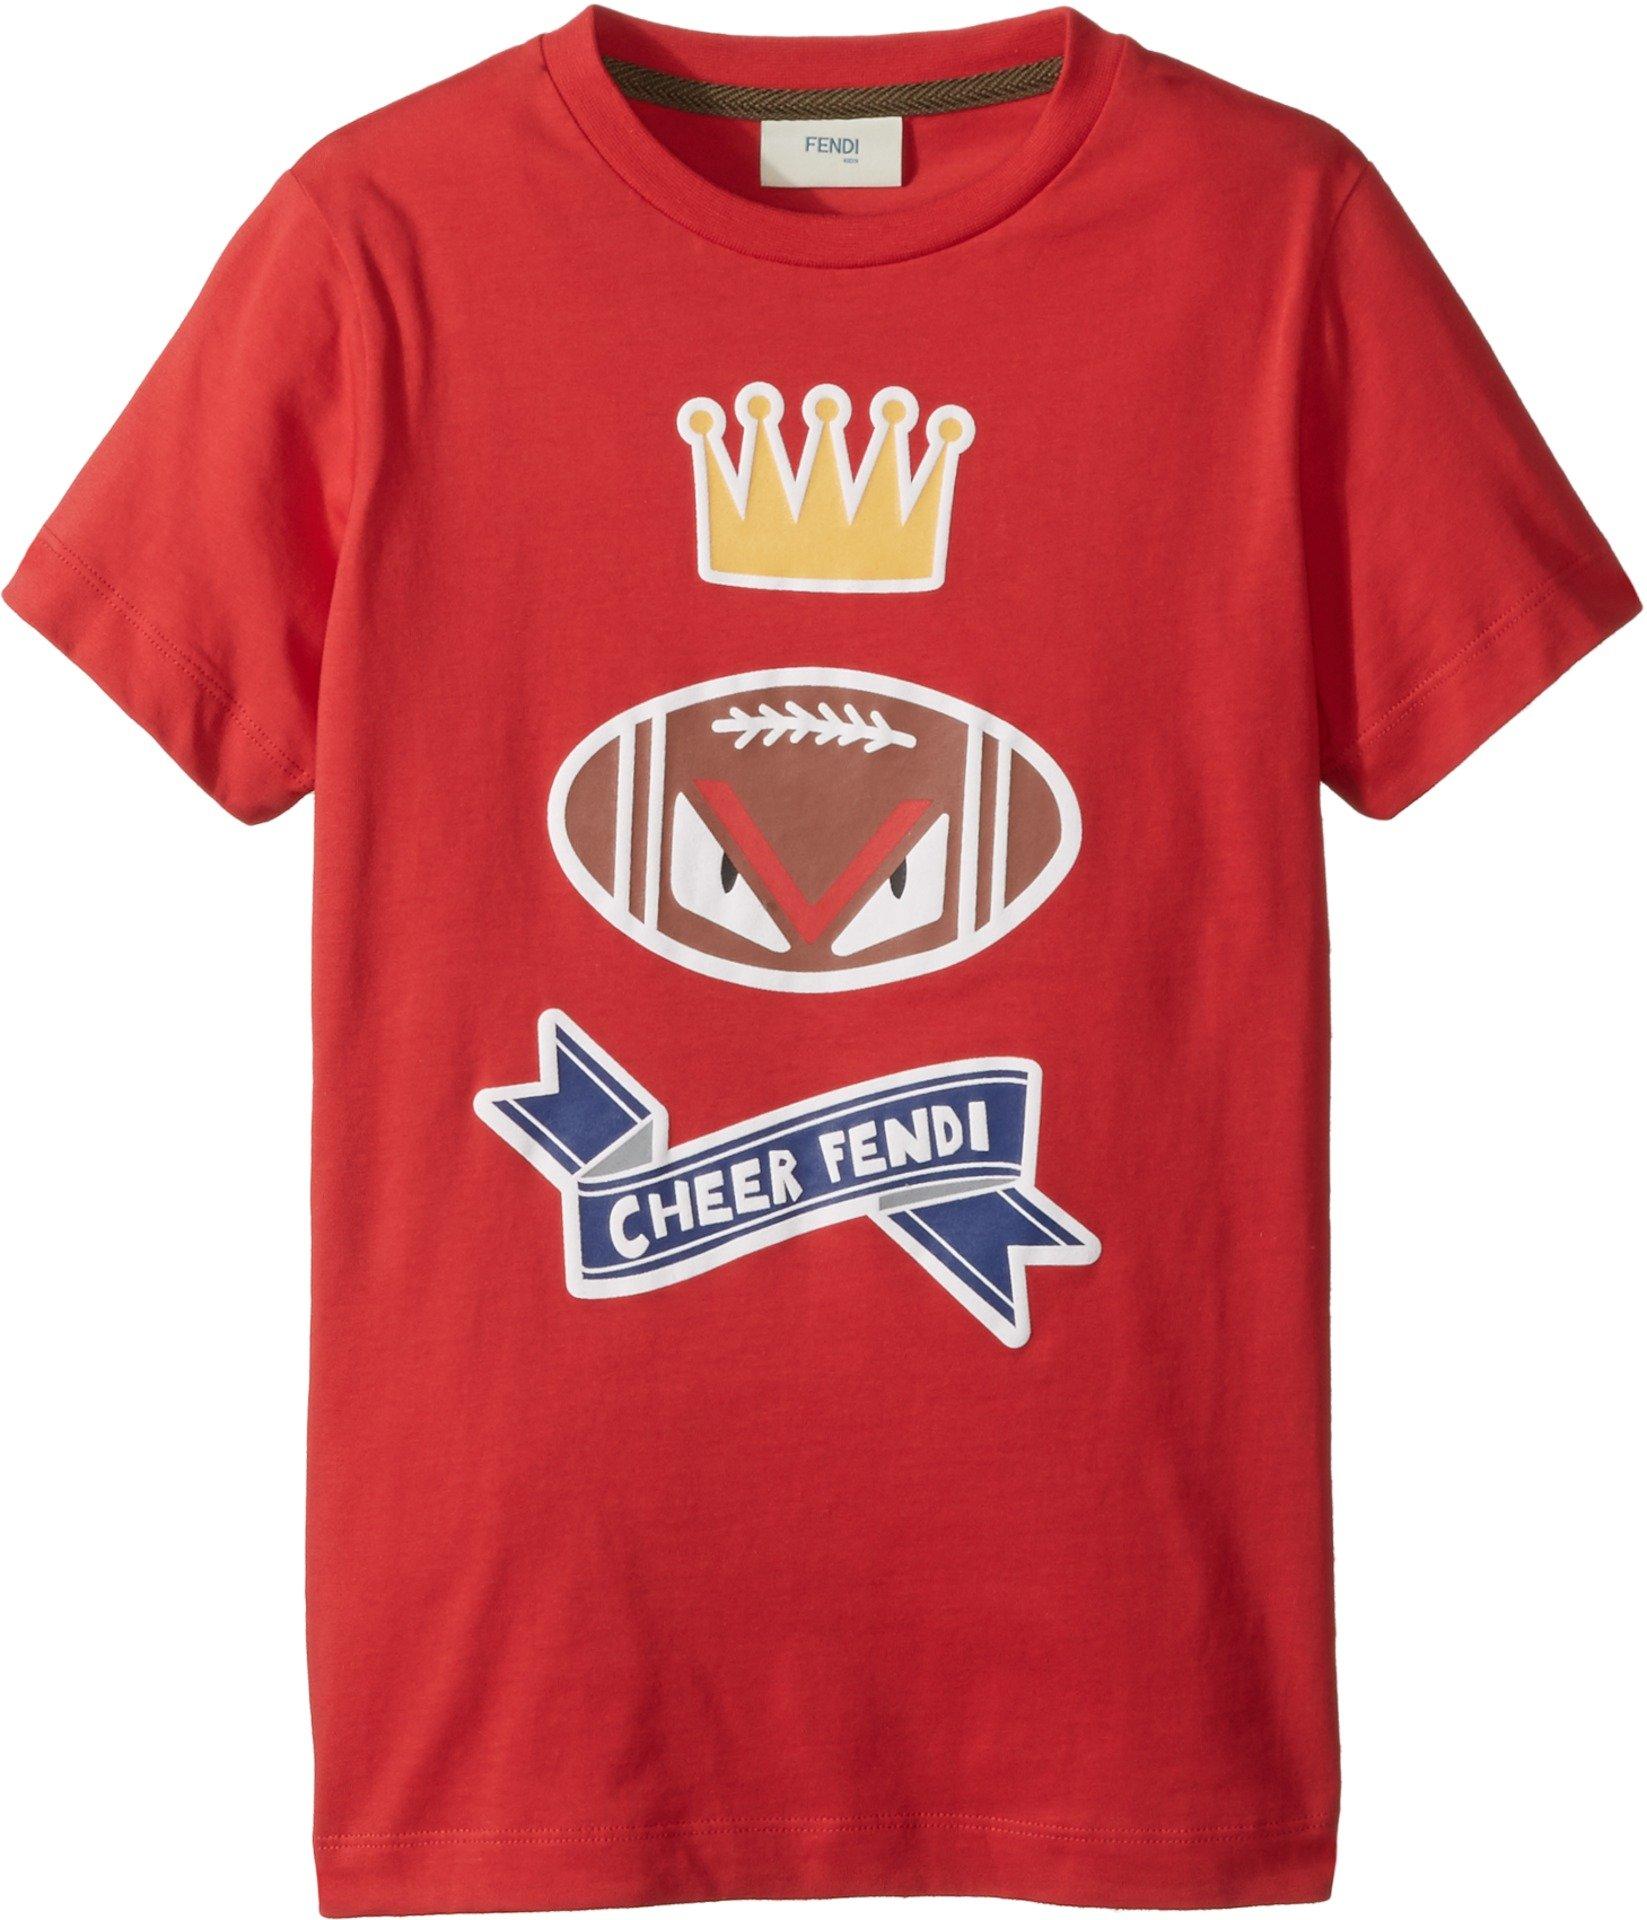 Fendi Kids Boy's Short Sleeve 'Cheer Fendi' Football Graphic T-Shirt (Little Kids) Red 8 Years